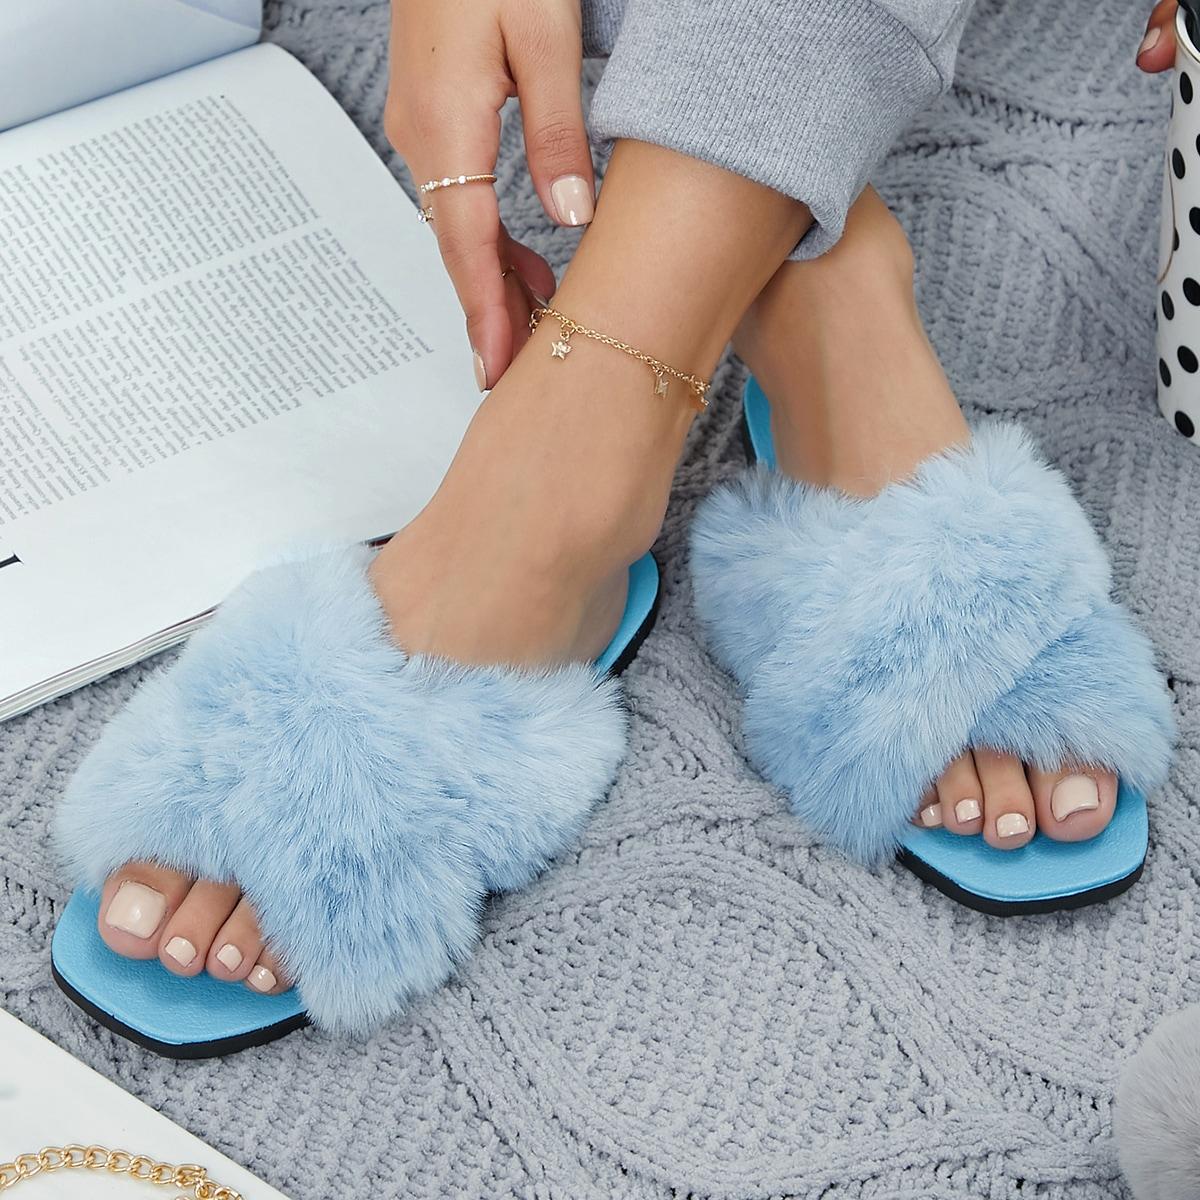 SHEIN / Marble Crisscross Vean Fur Sandals